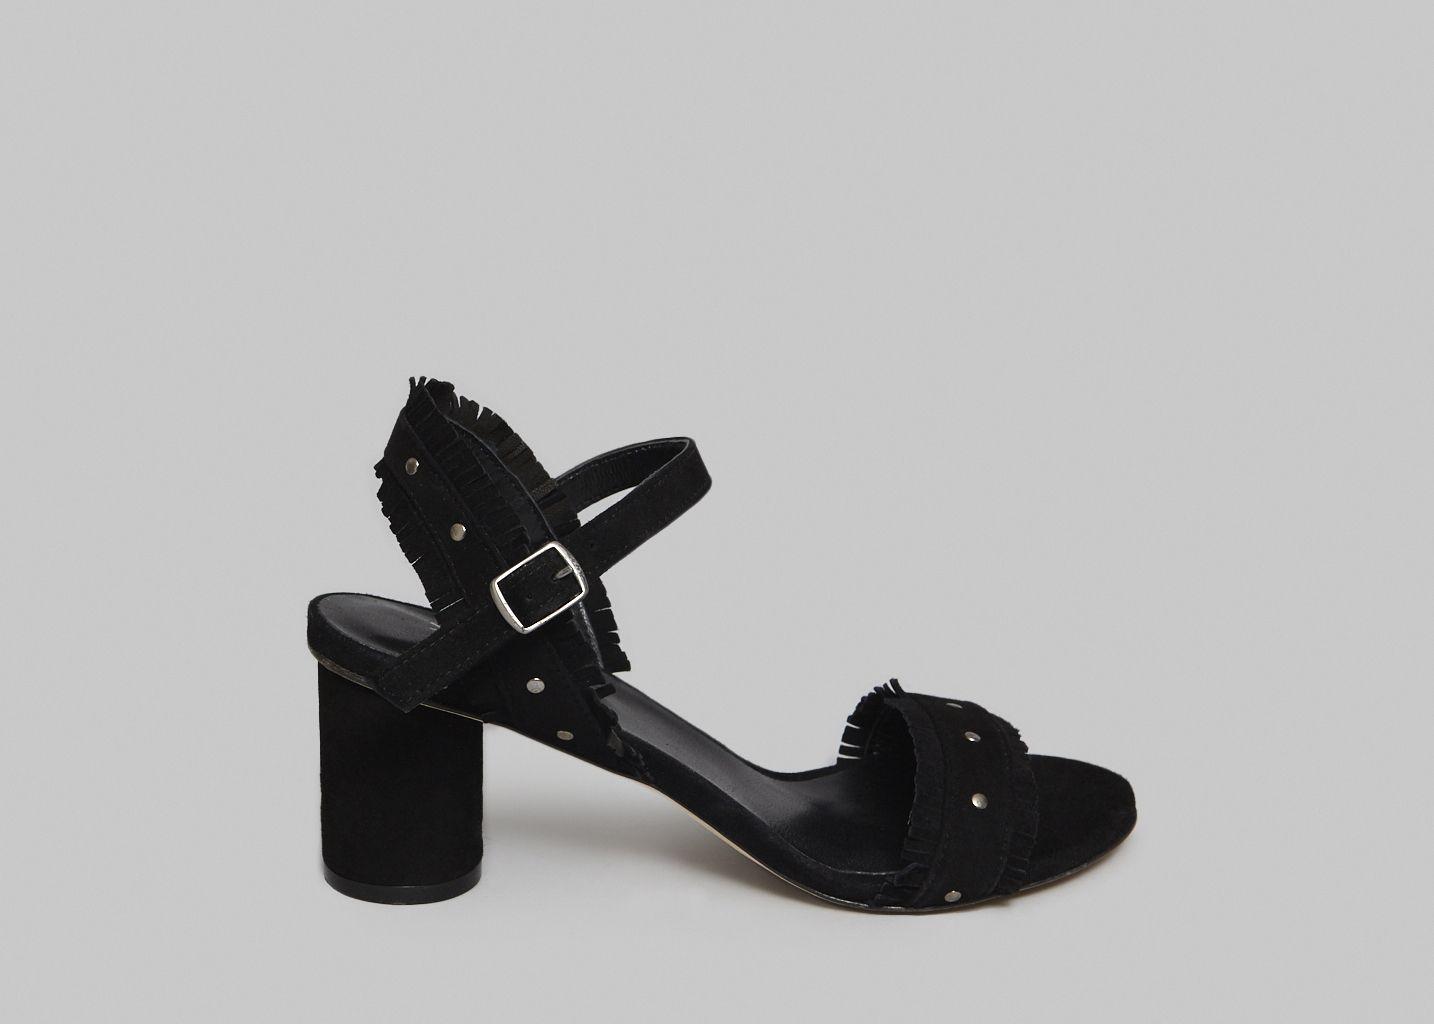 Milagro Sandals - Anaki